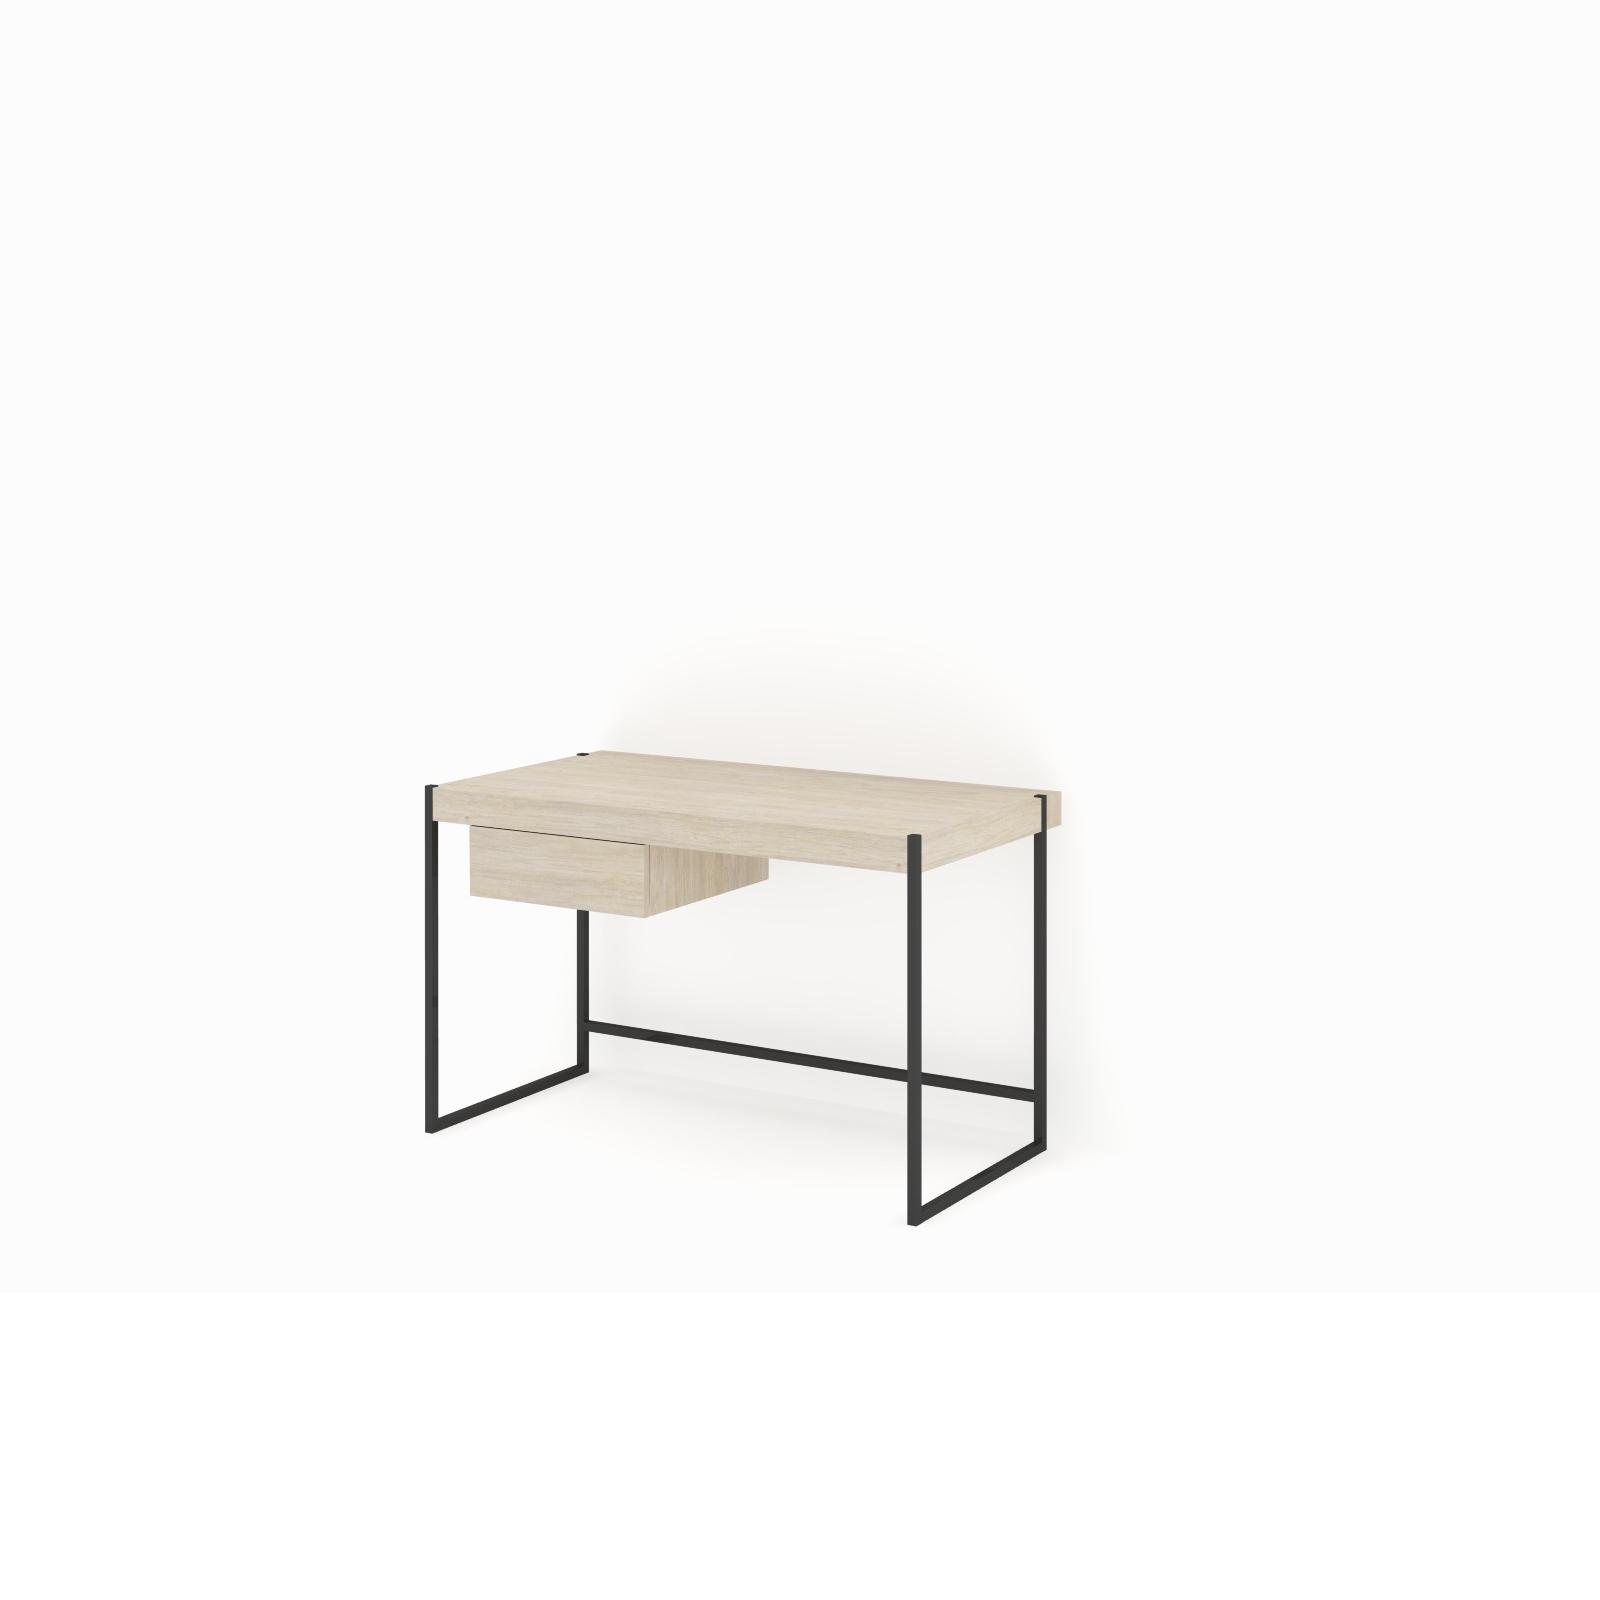 01.41.0450 40_00 szuflada z biurkiem